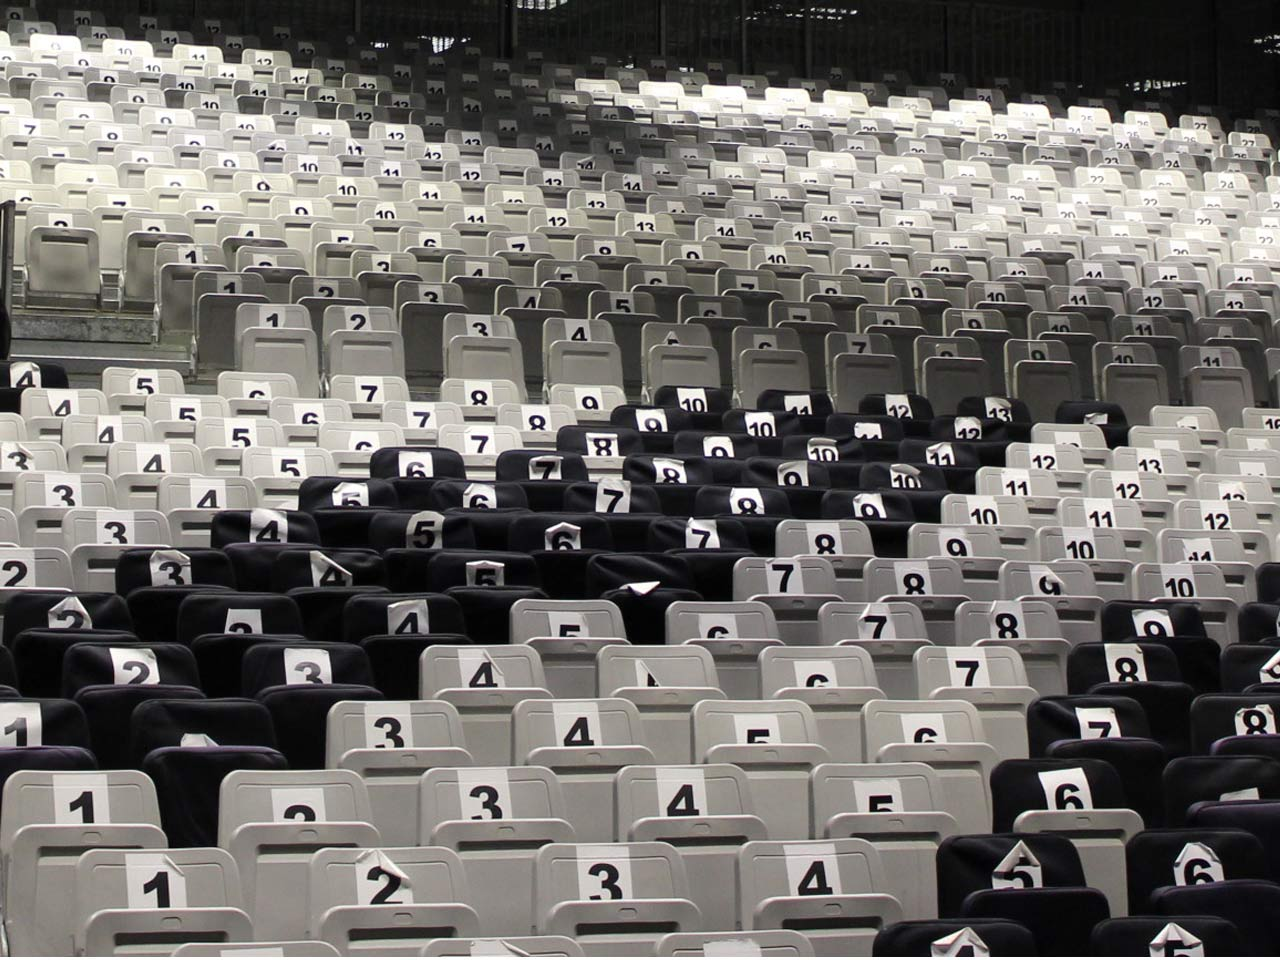 grandstand-seats-events-setup-rental-stadium-seating-sport-management-film-festival-seating-screening-f1-open-air-cinema-17